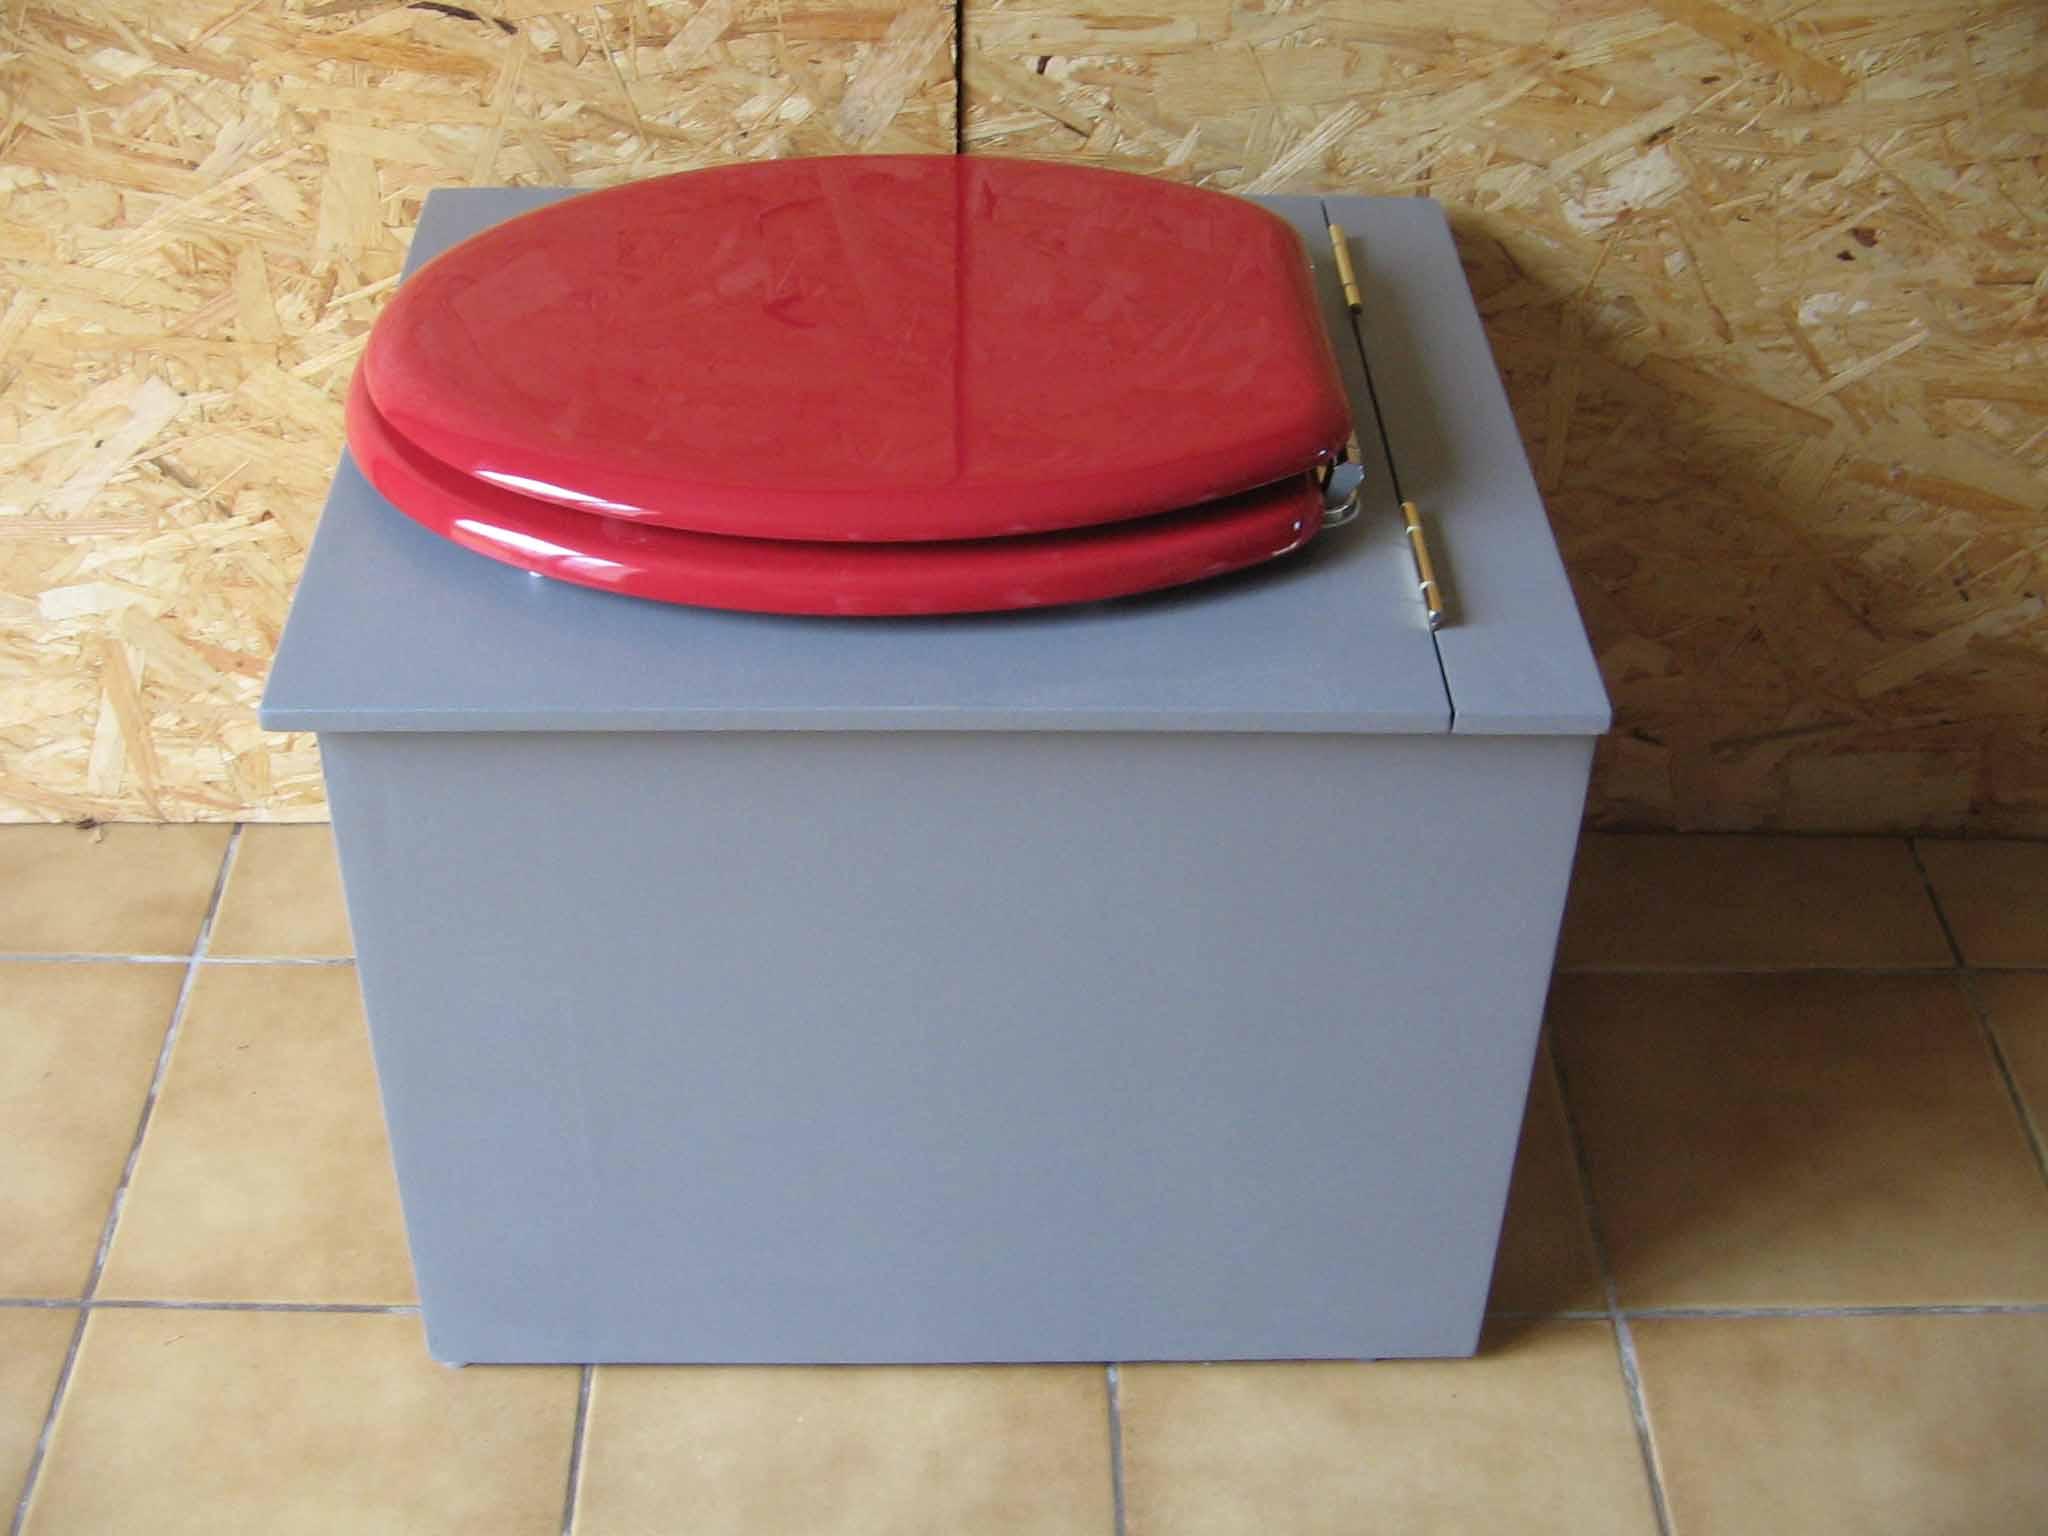 toilette sèche originale gris